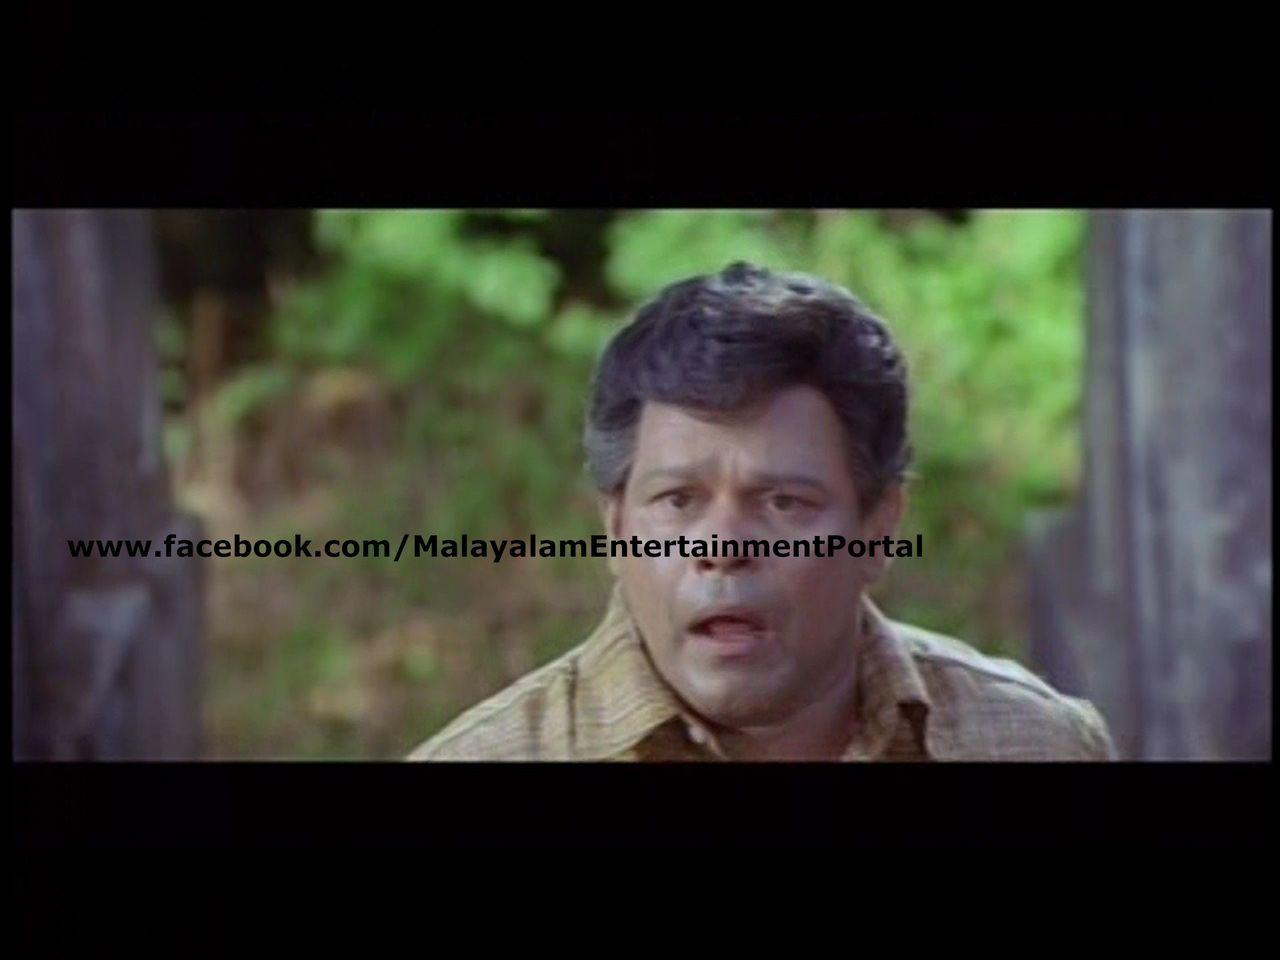 Narendran Makan Jayakanthan Vaka DVD Screenshots (Saina) Bscap0010